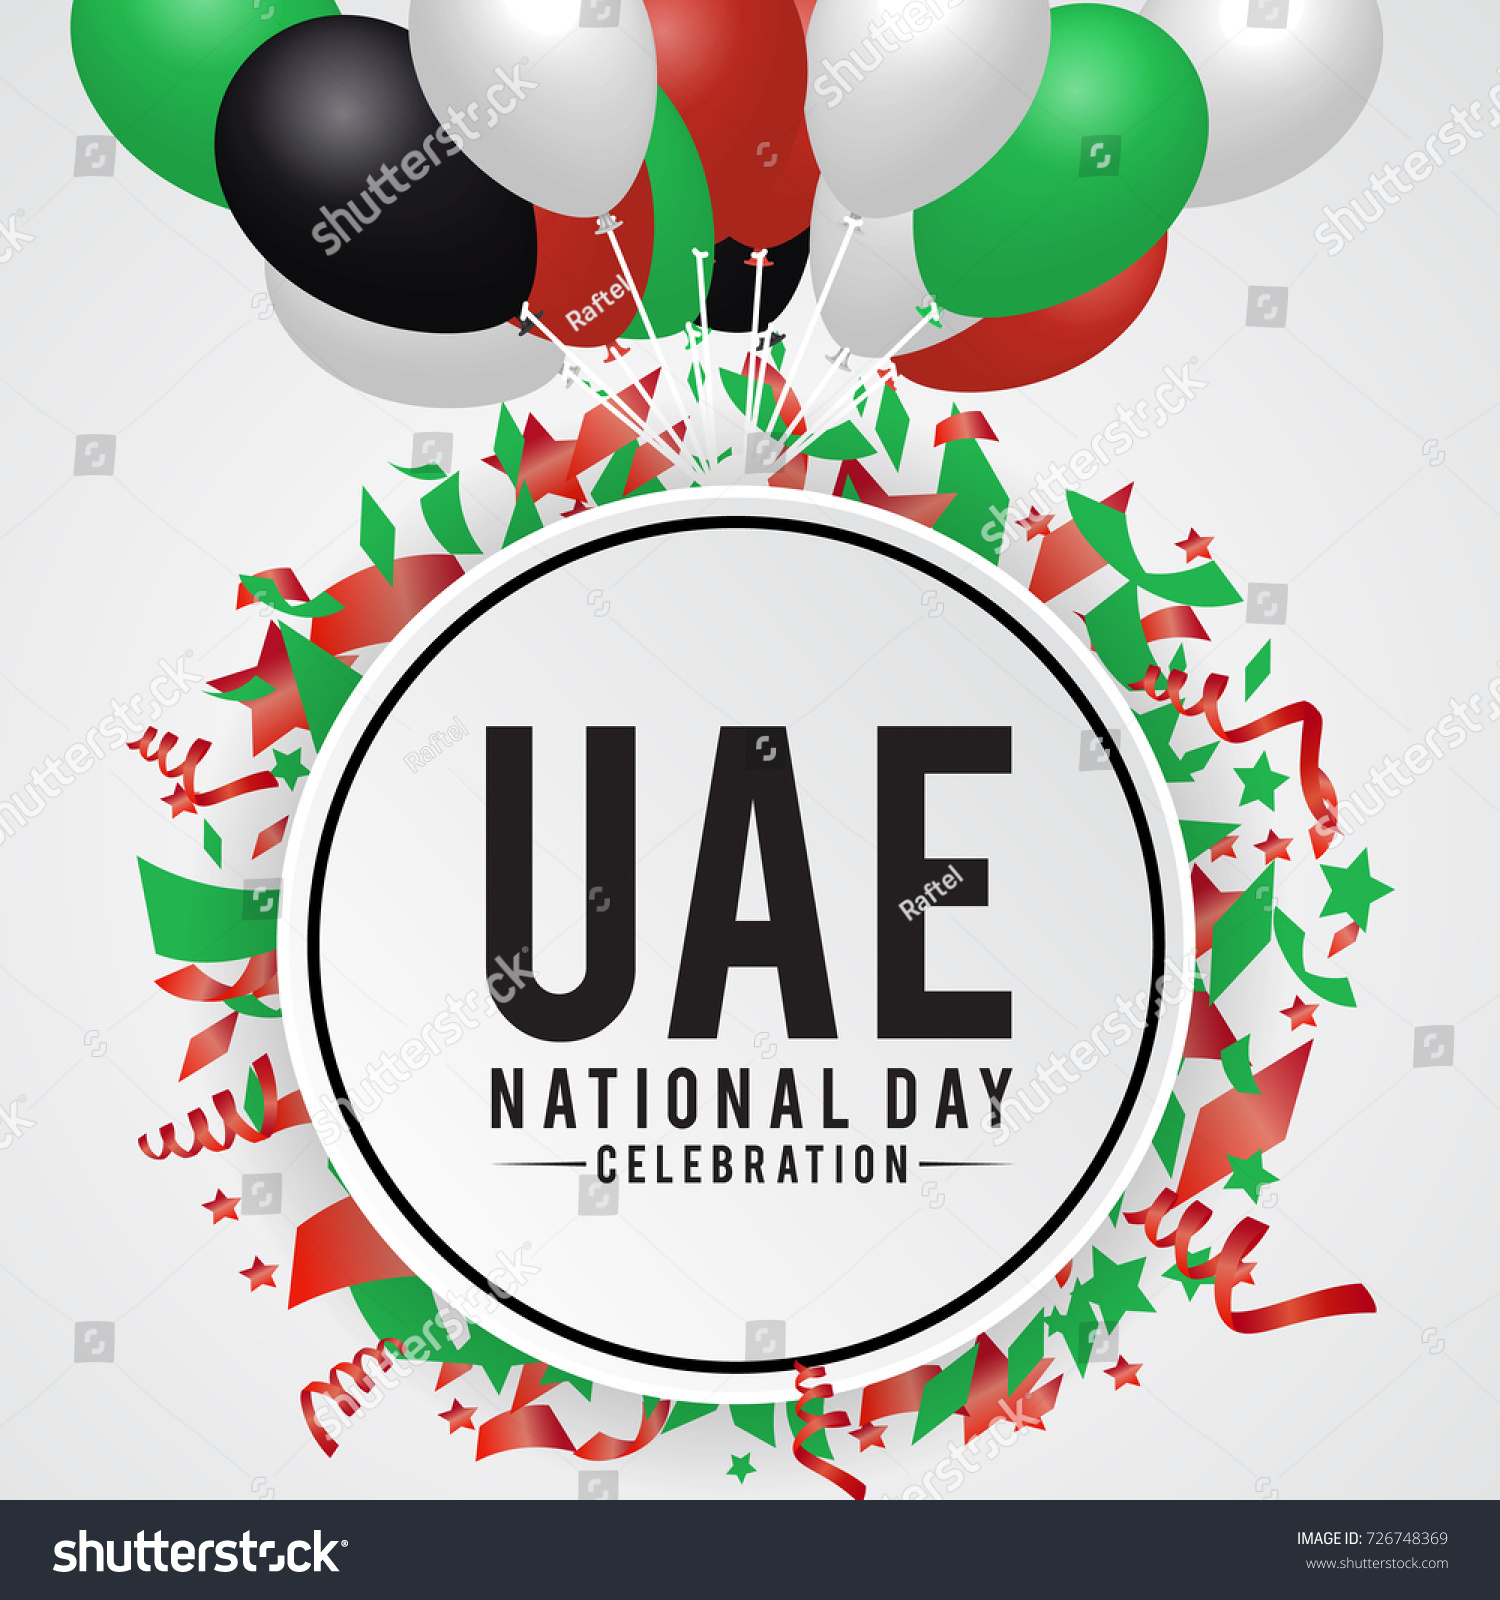 United Arab Emirates National Day Background Stock Vector (Royalty ...